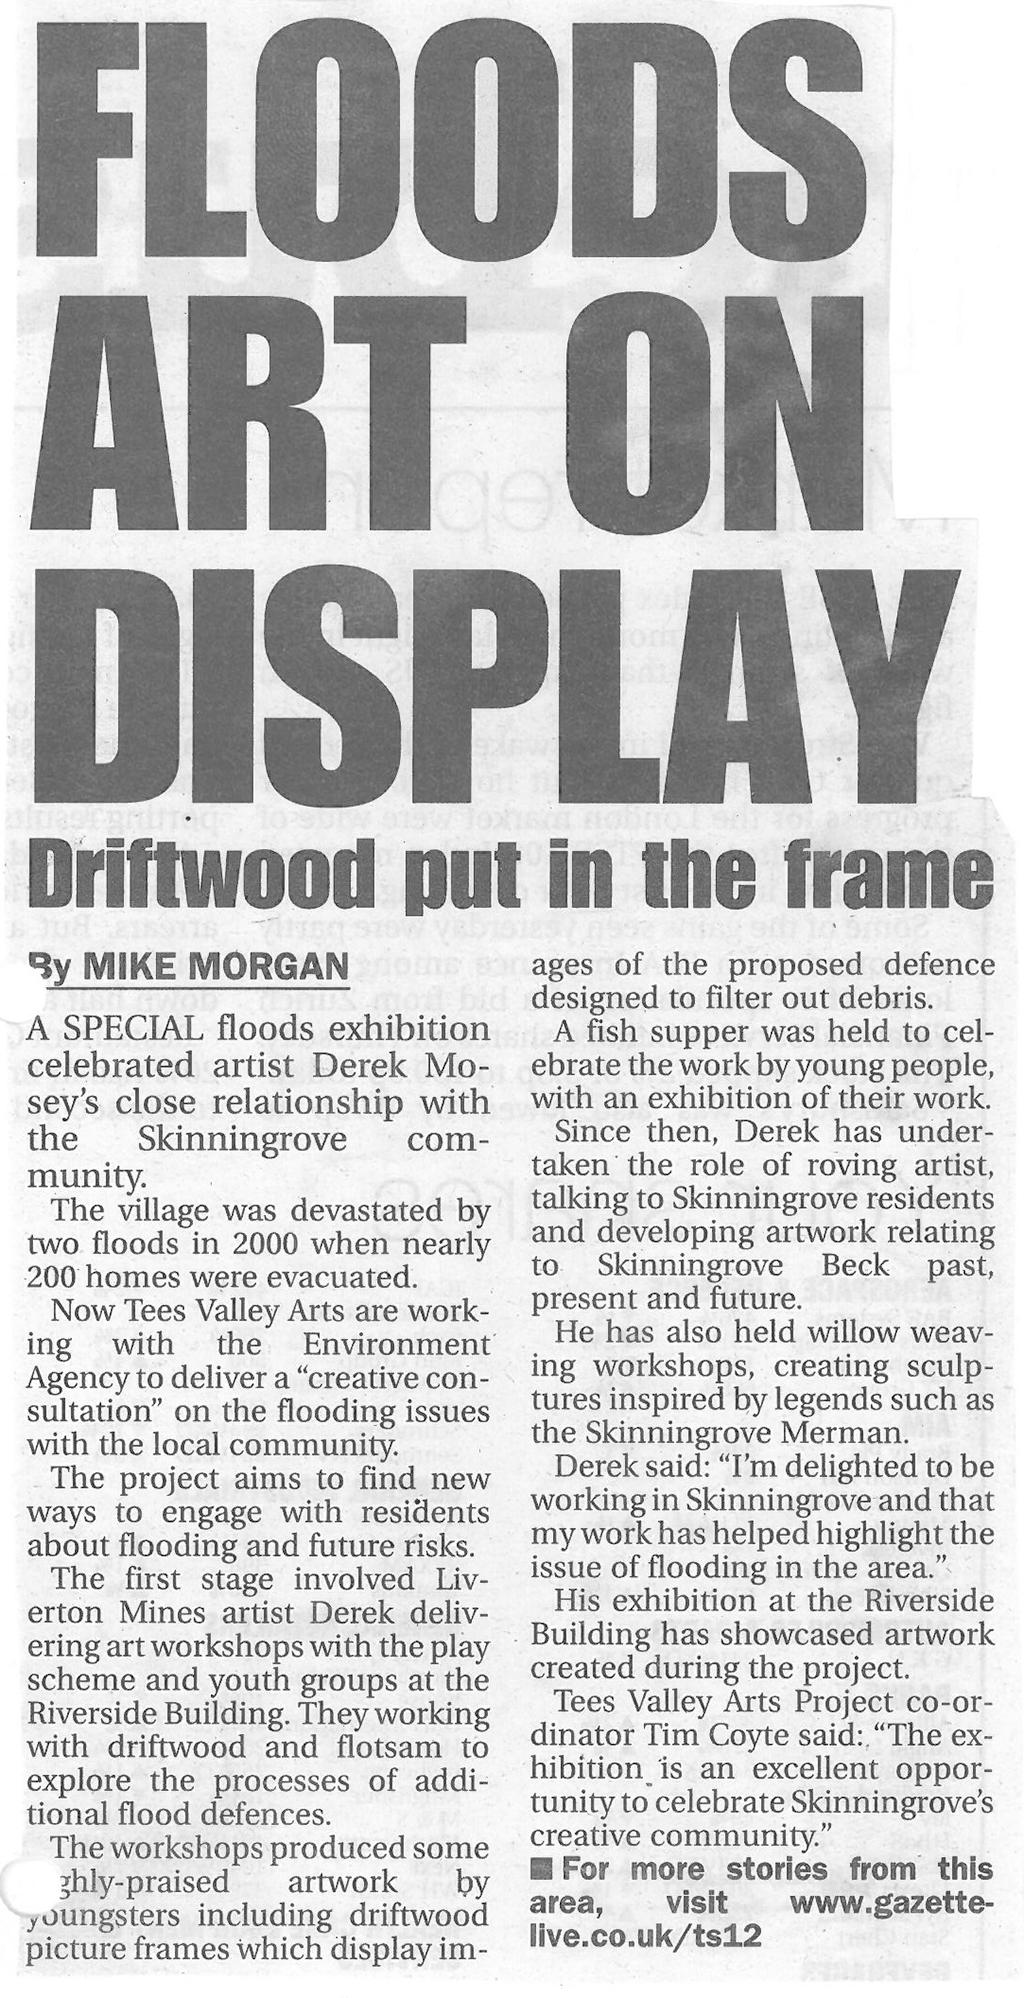 2008-08-29, Evening Gazette